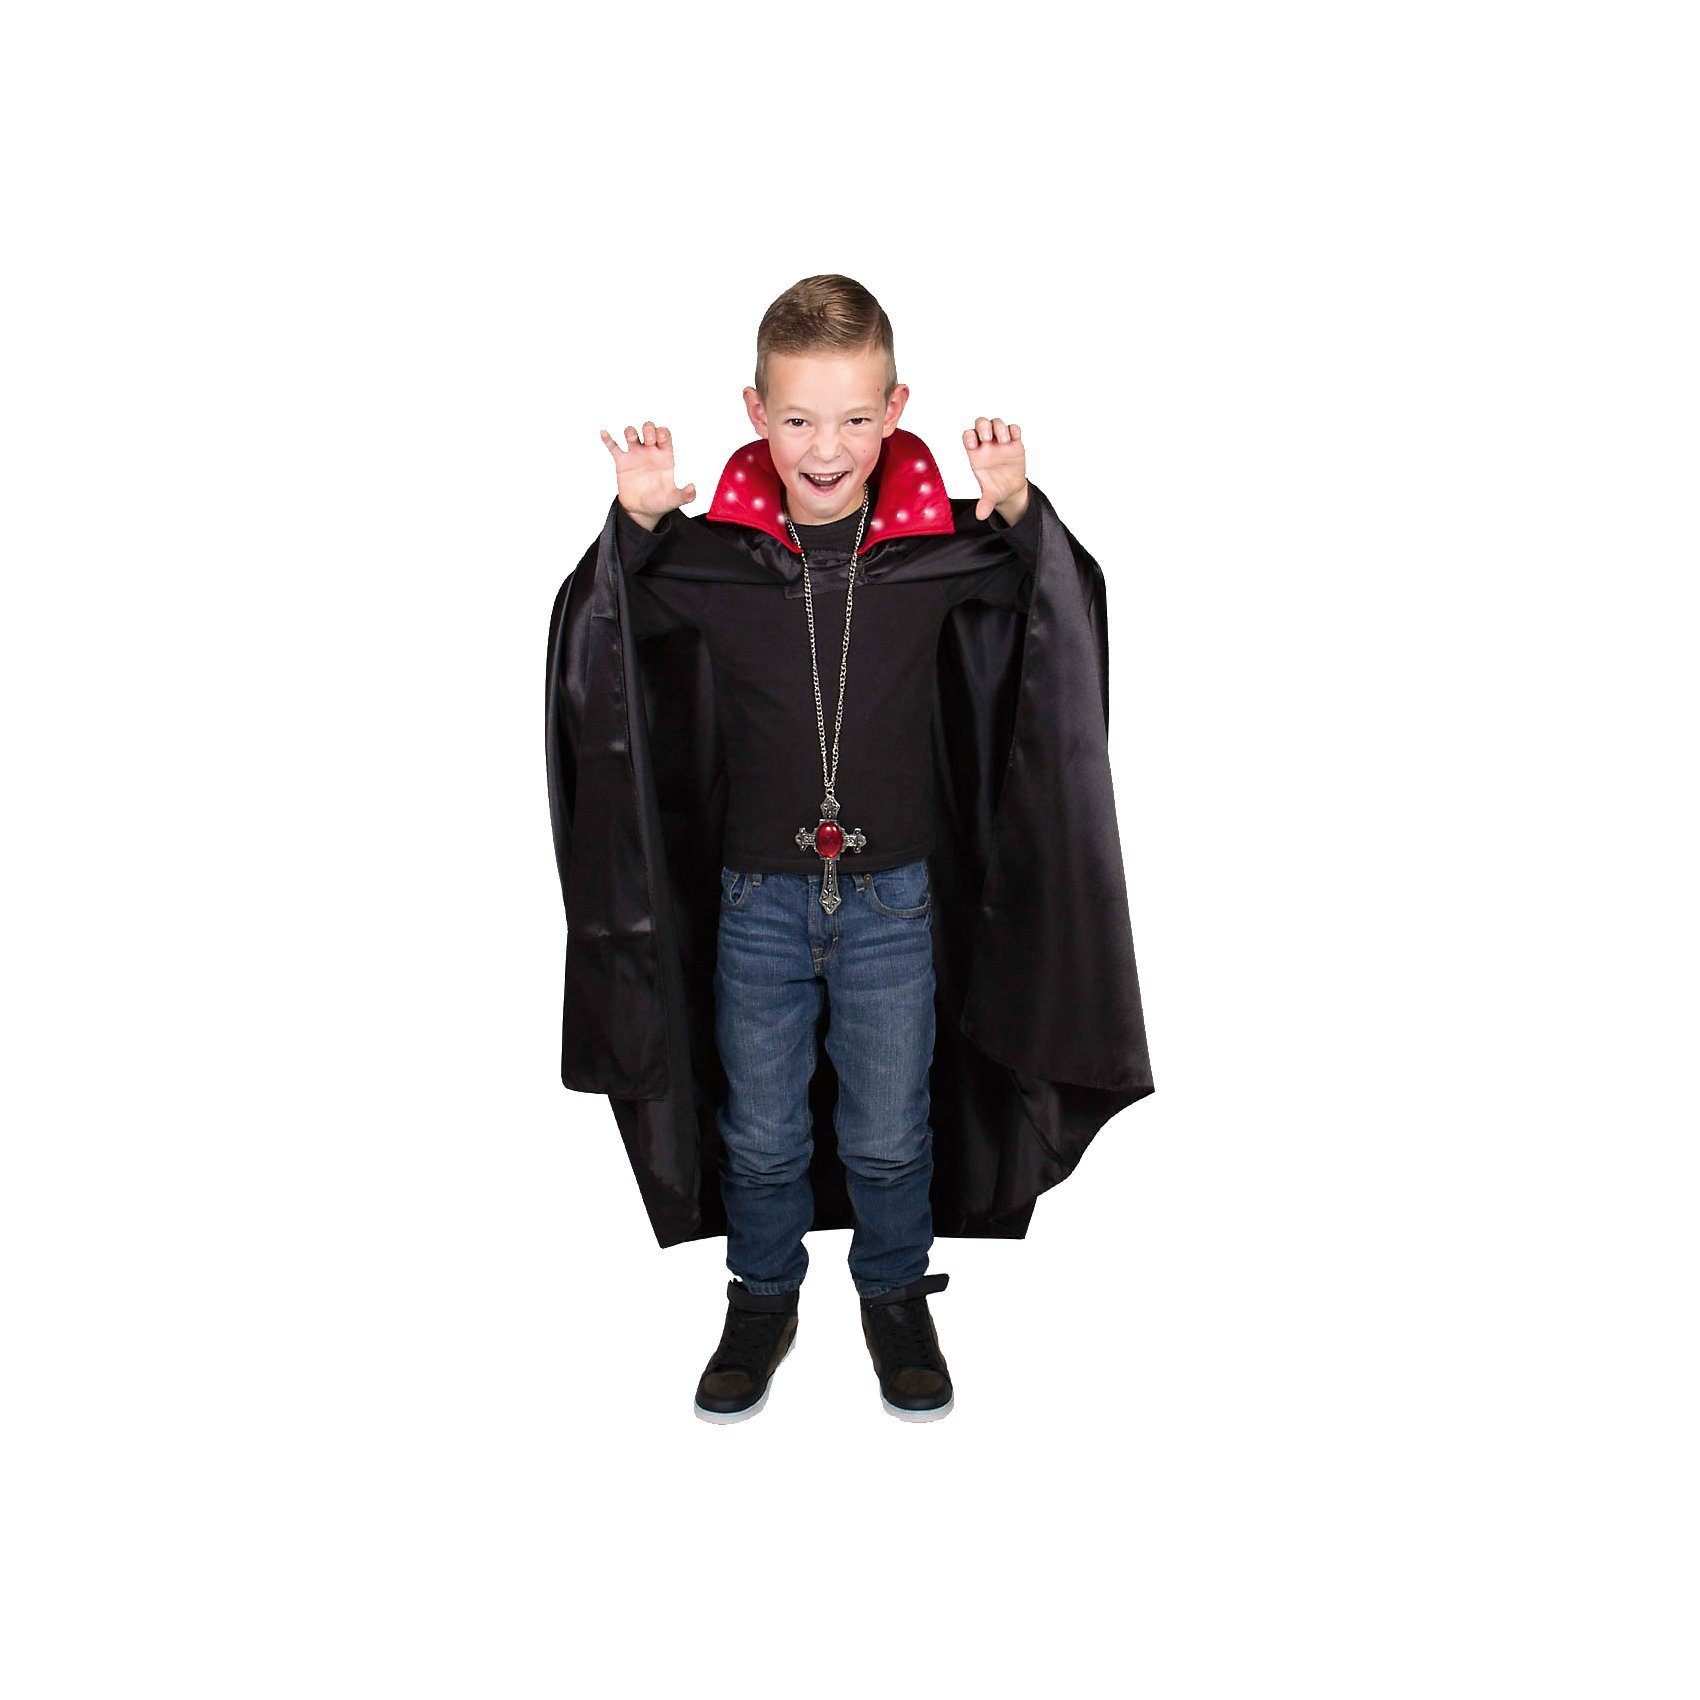 Umhang Dracula mit LED